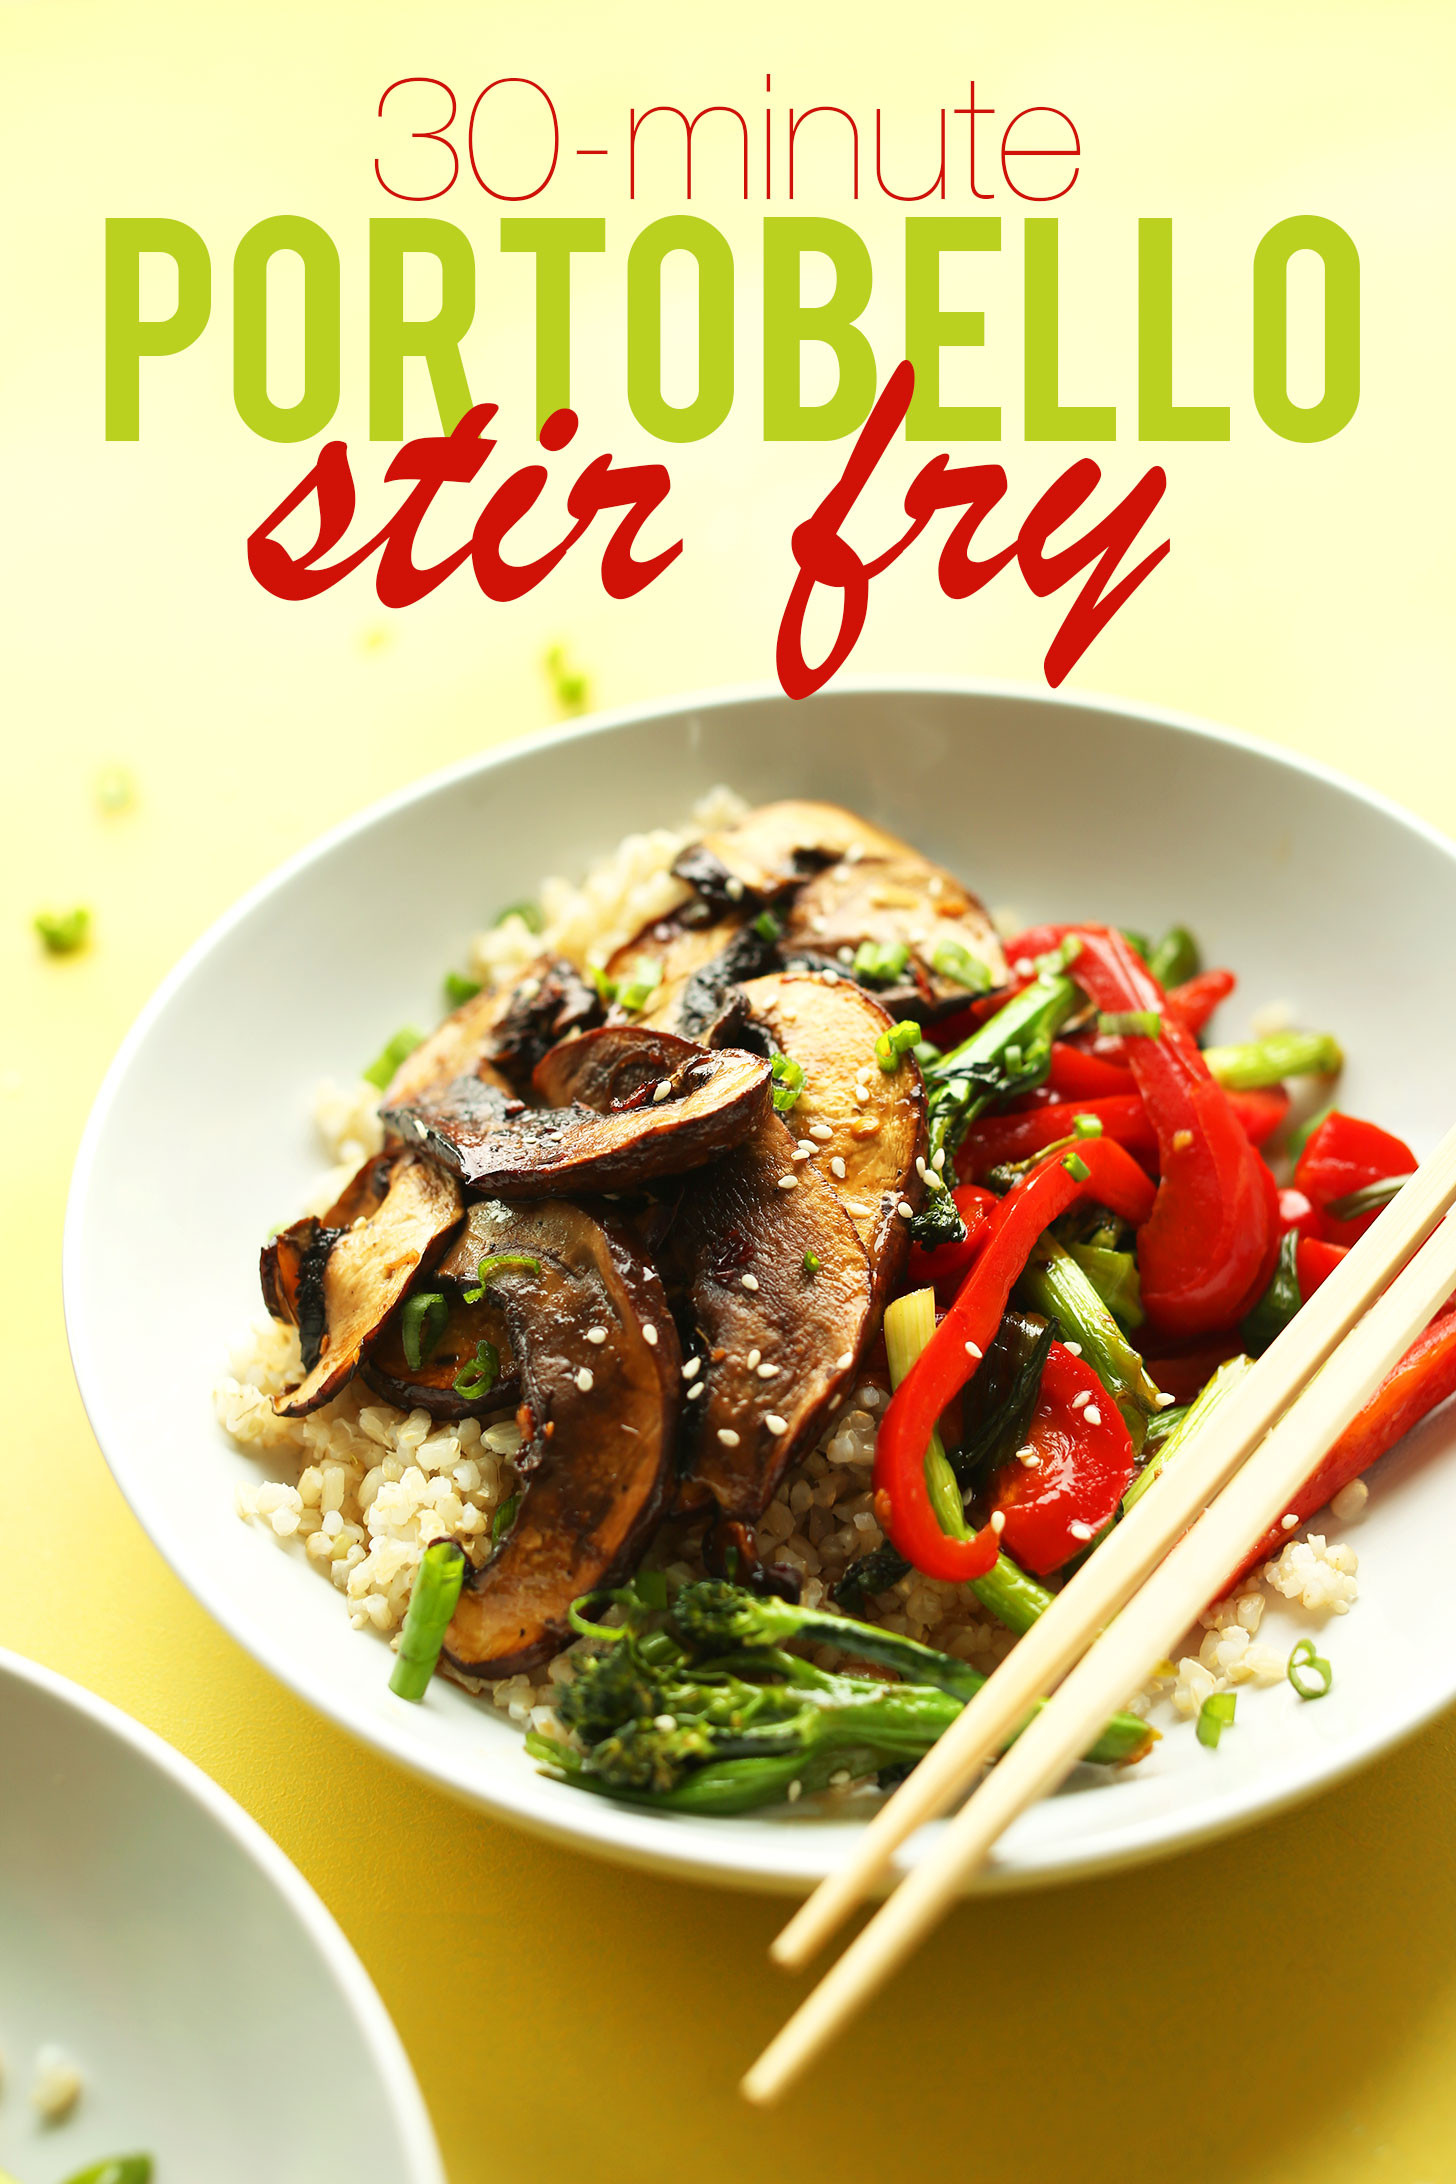 Vegan Portobello Recipes  Portobello Mushroom Stir Fry